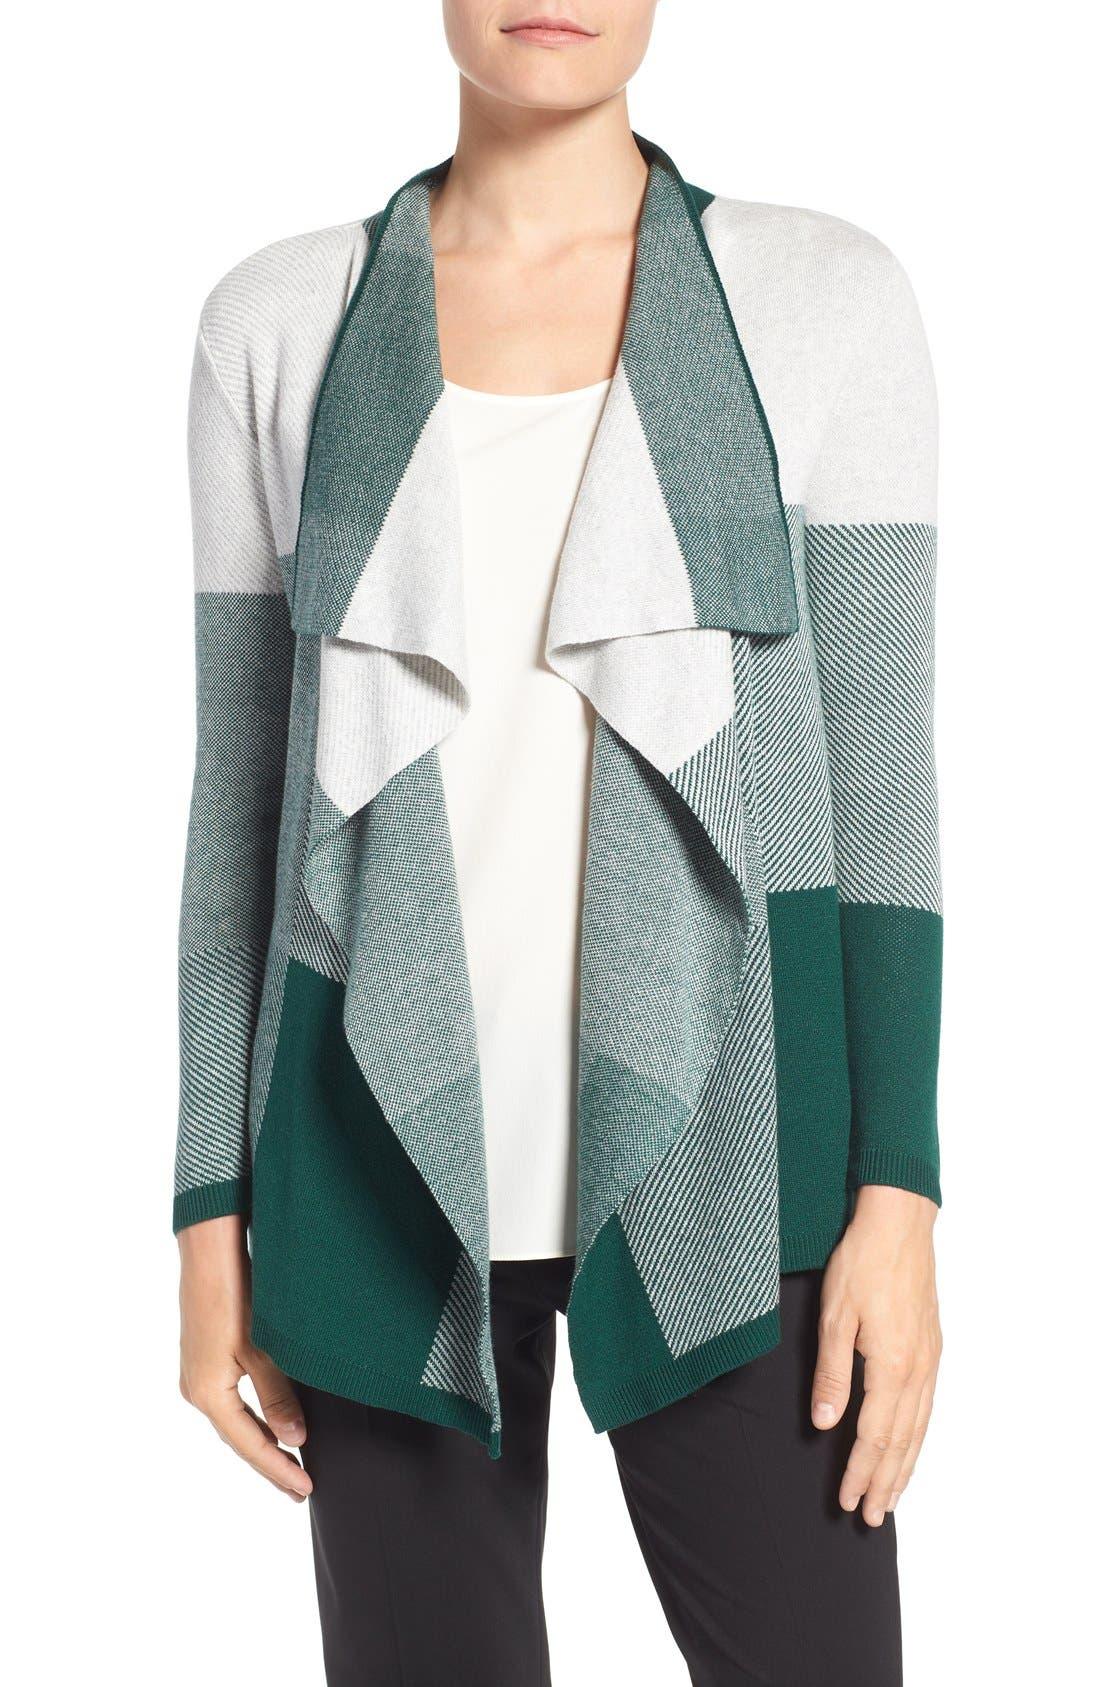 Alternate Image 1 Selected - Chaus Colorblock Jacquard Drape Front Cardigan